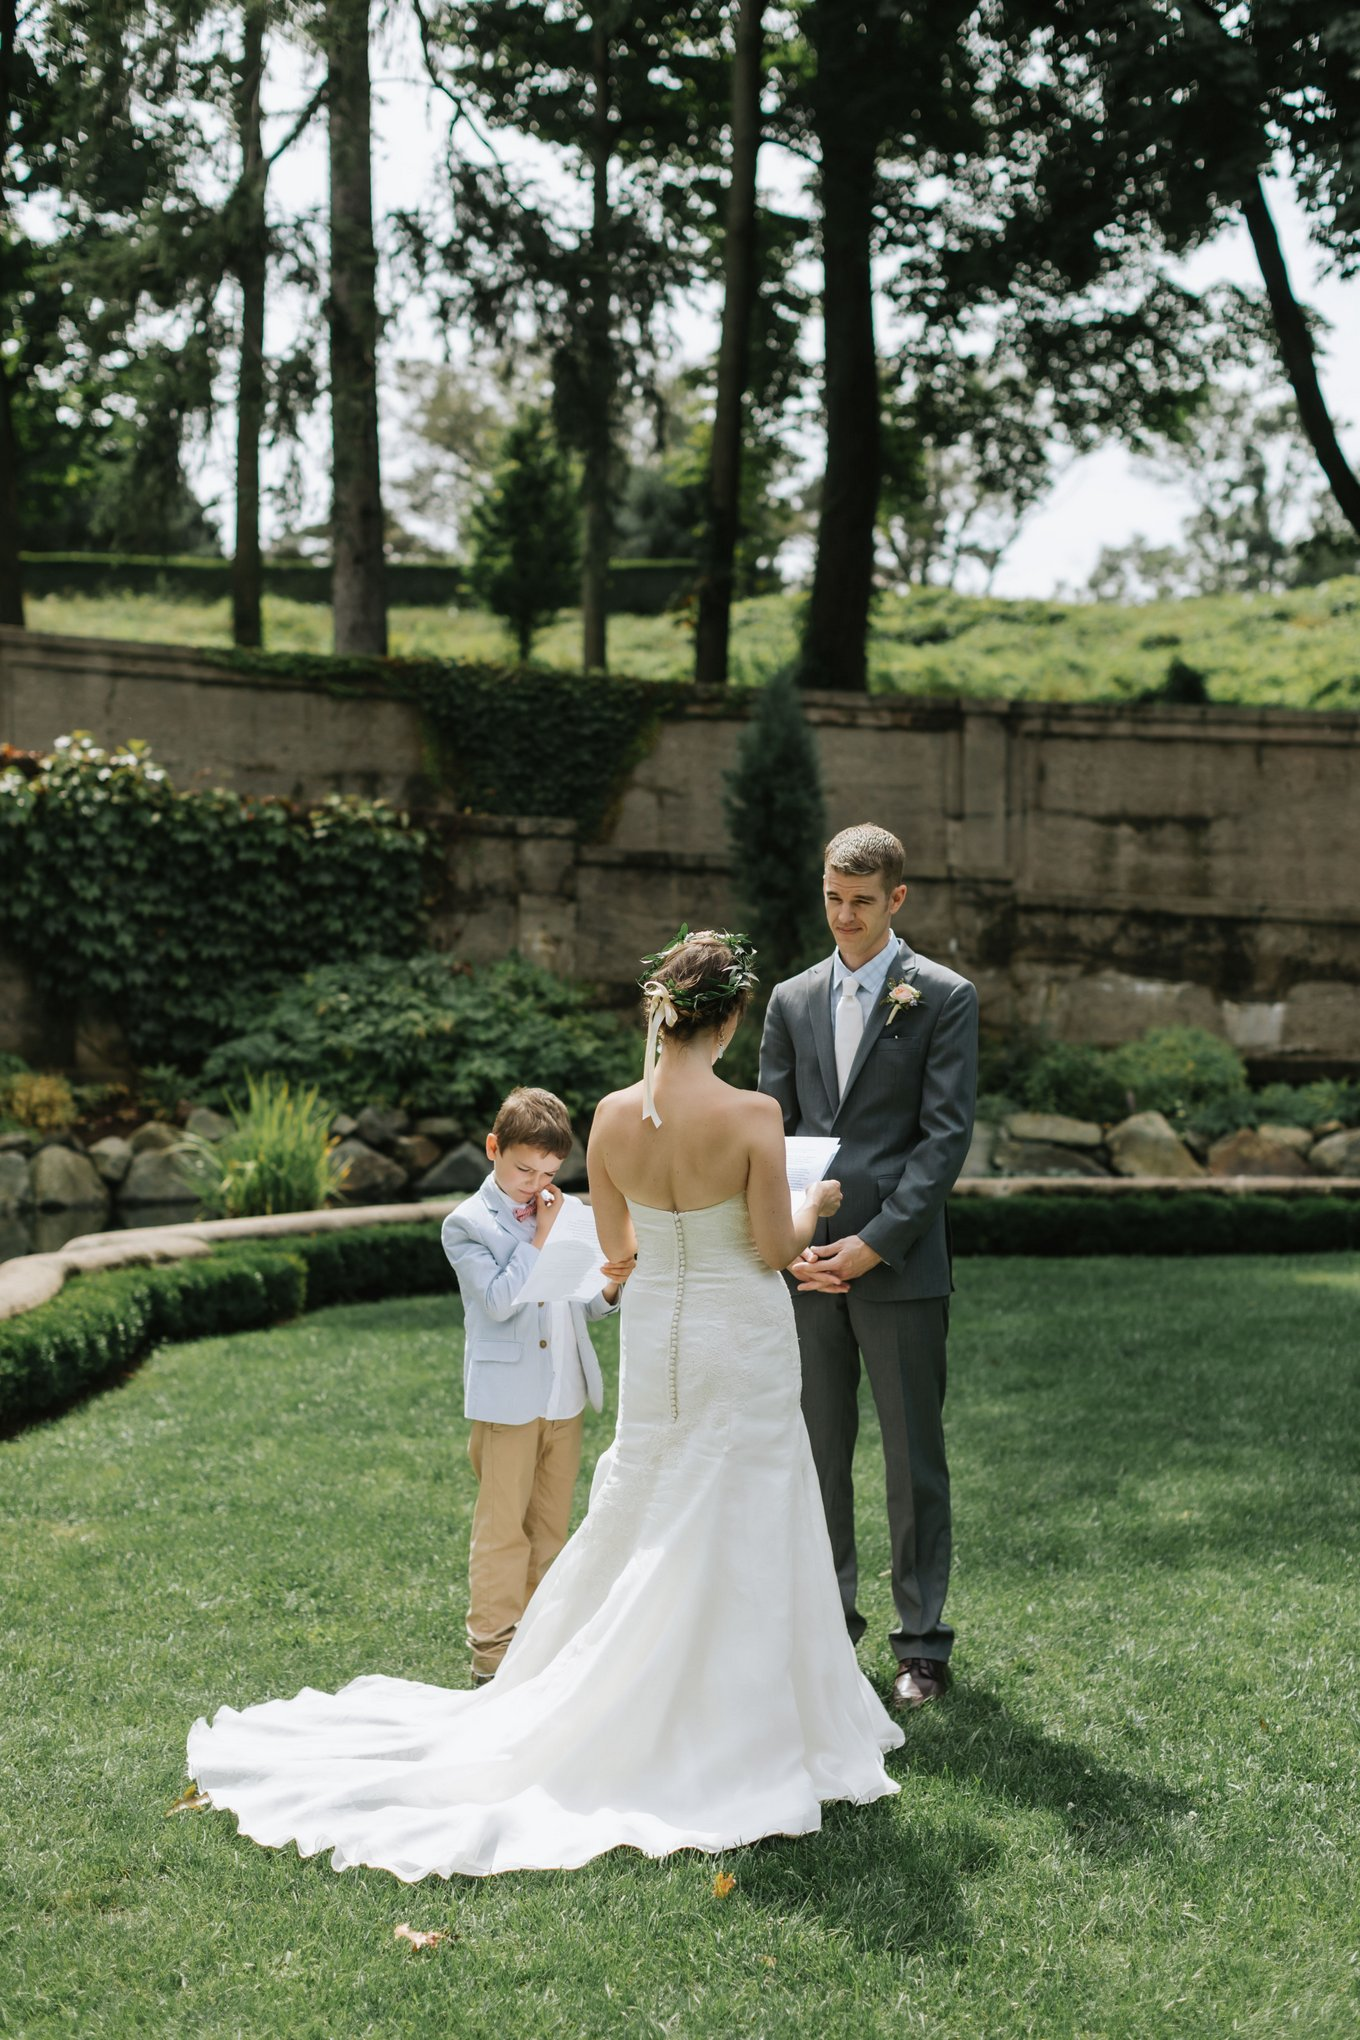 Crane-Estate-Vow-Renewal-Wedding-5.JPG